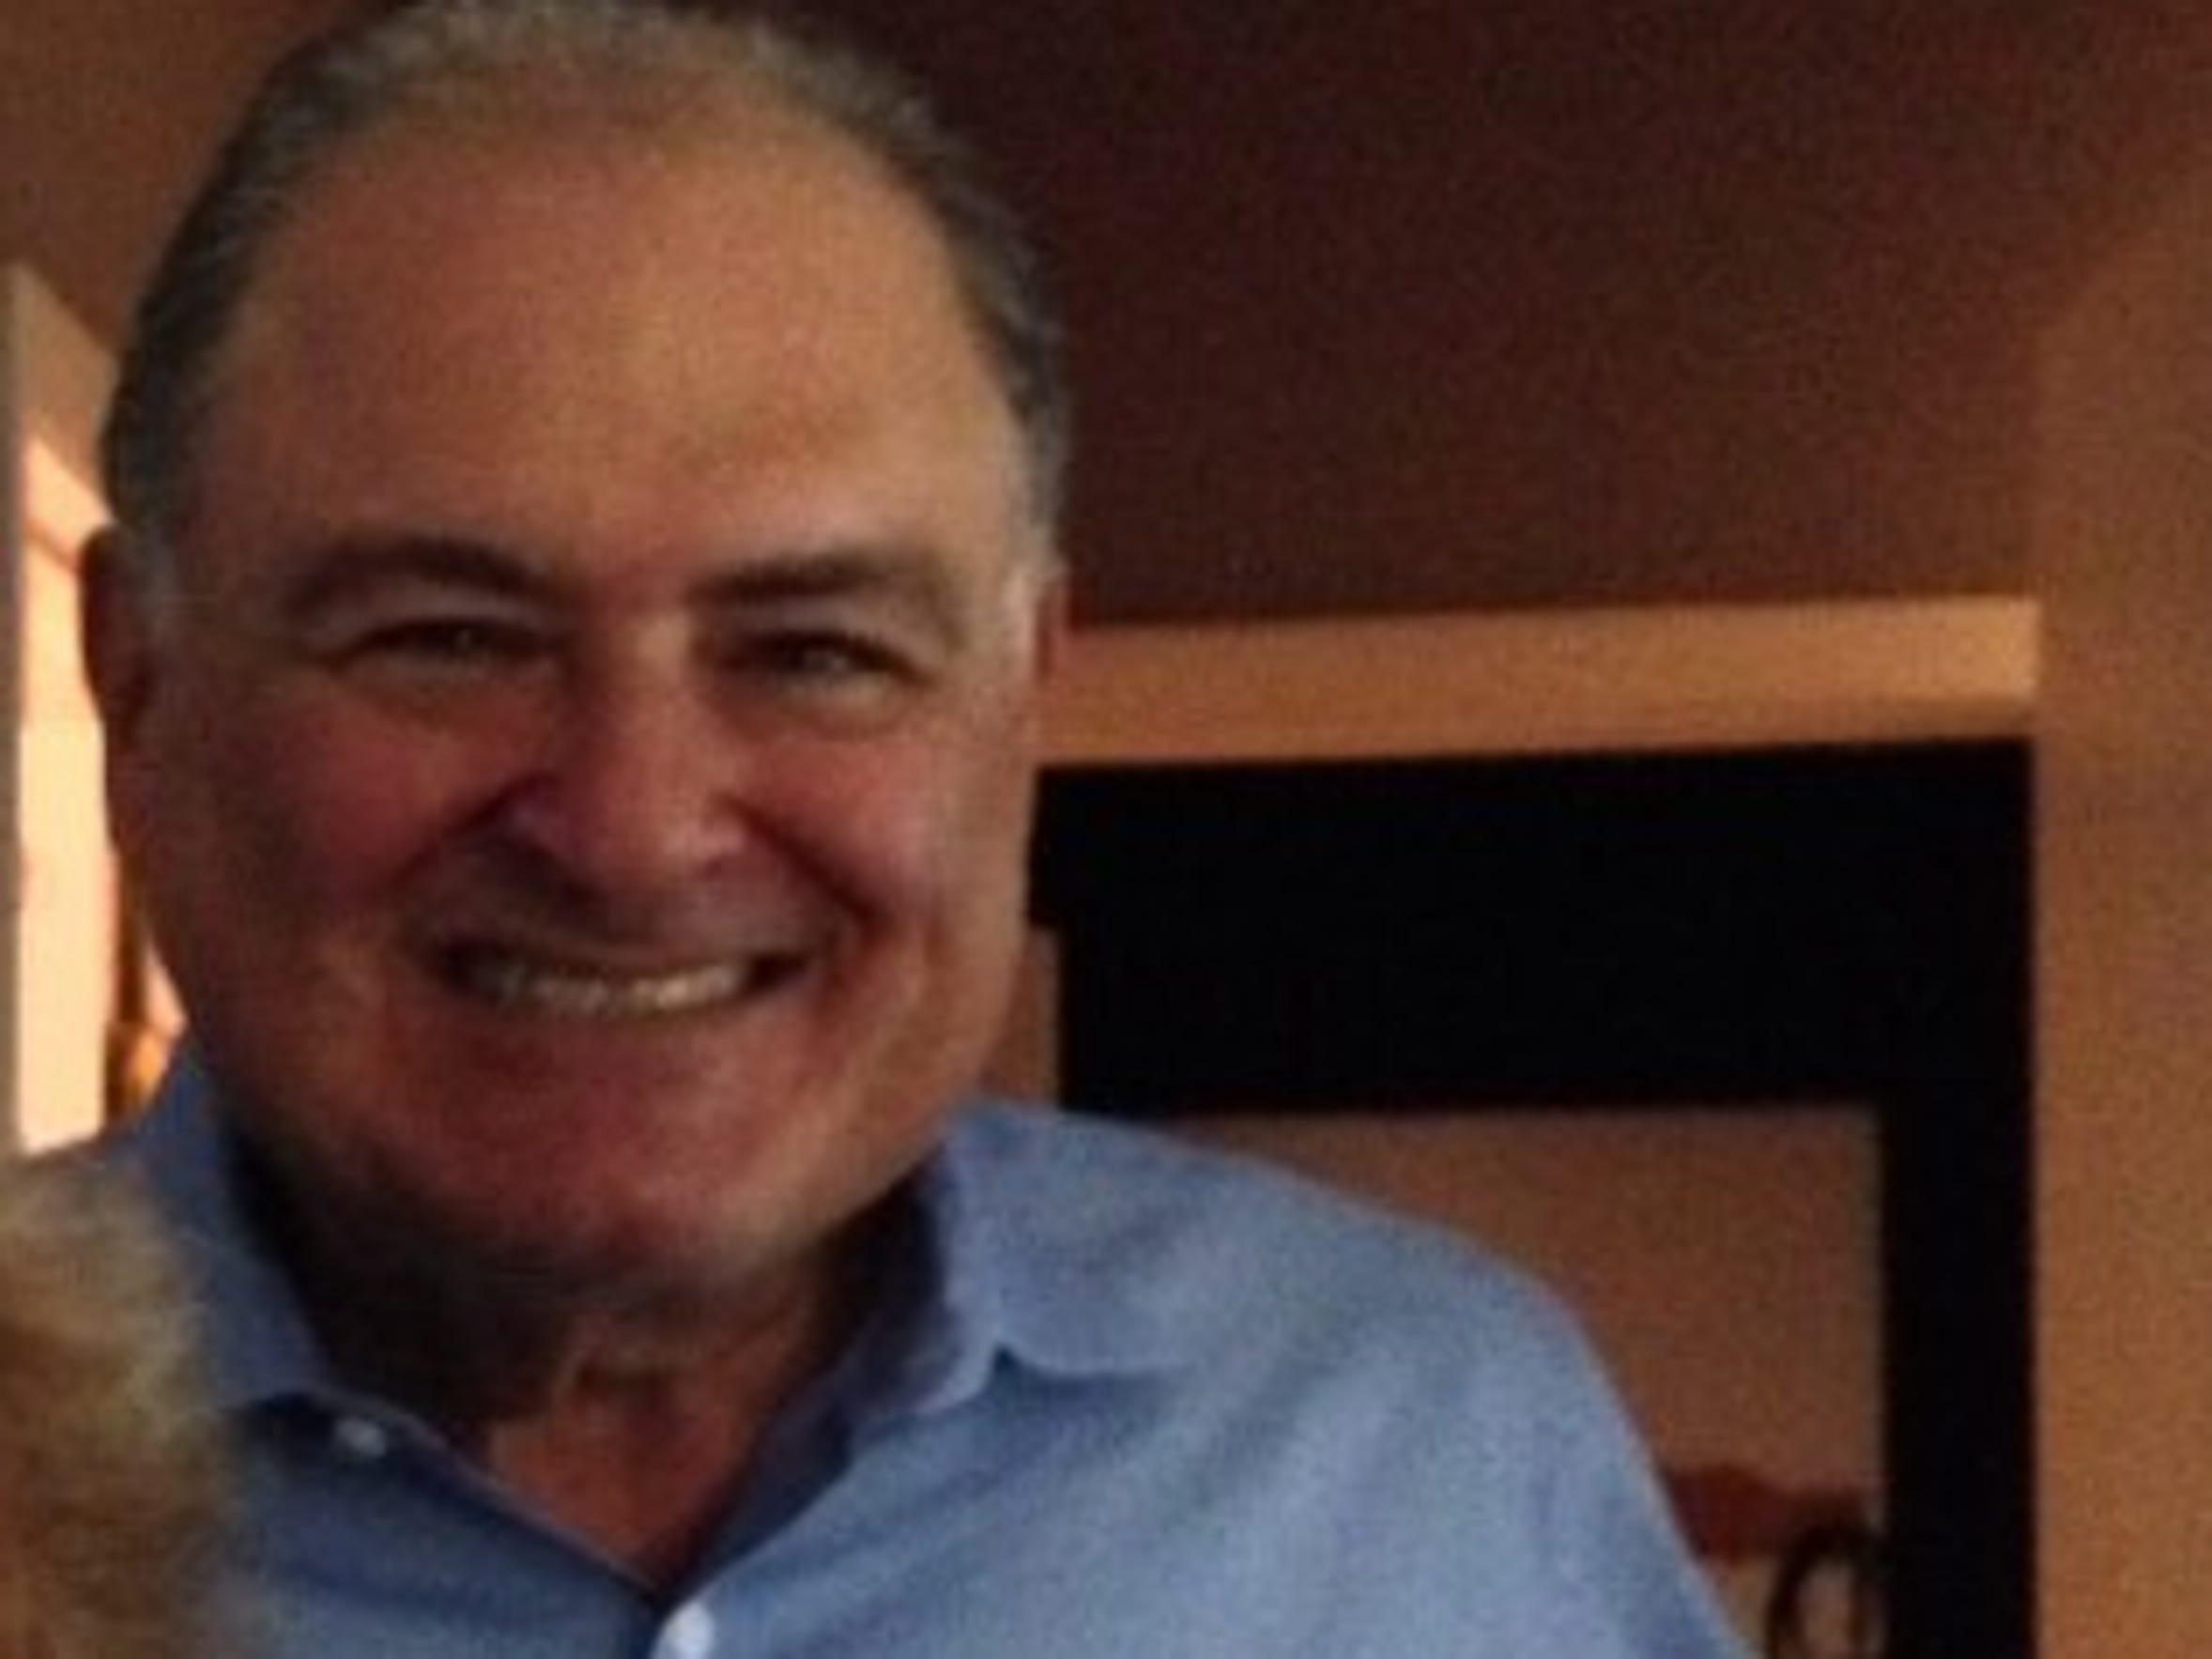 Dr. Sam Sugar, a Florida internist, has been advocating